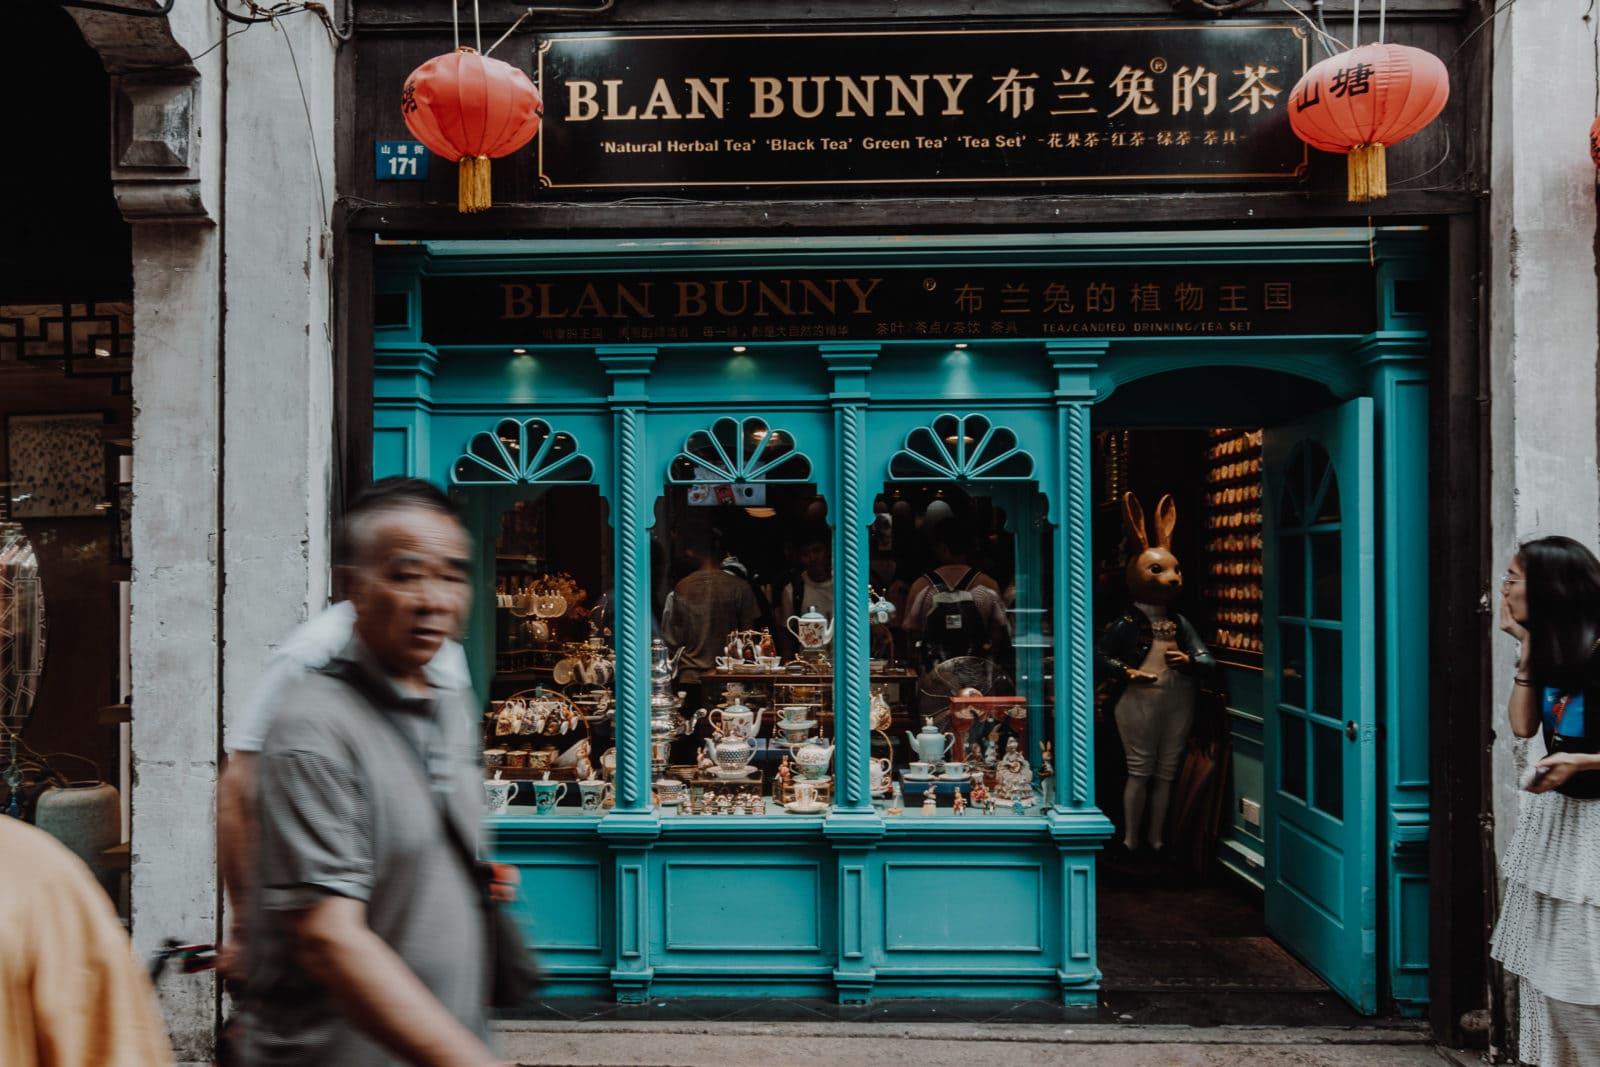 Suzhou Shopping Blan Bunny Teeladen Shantang Street